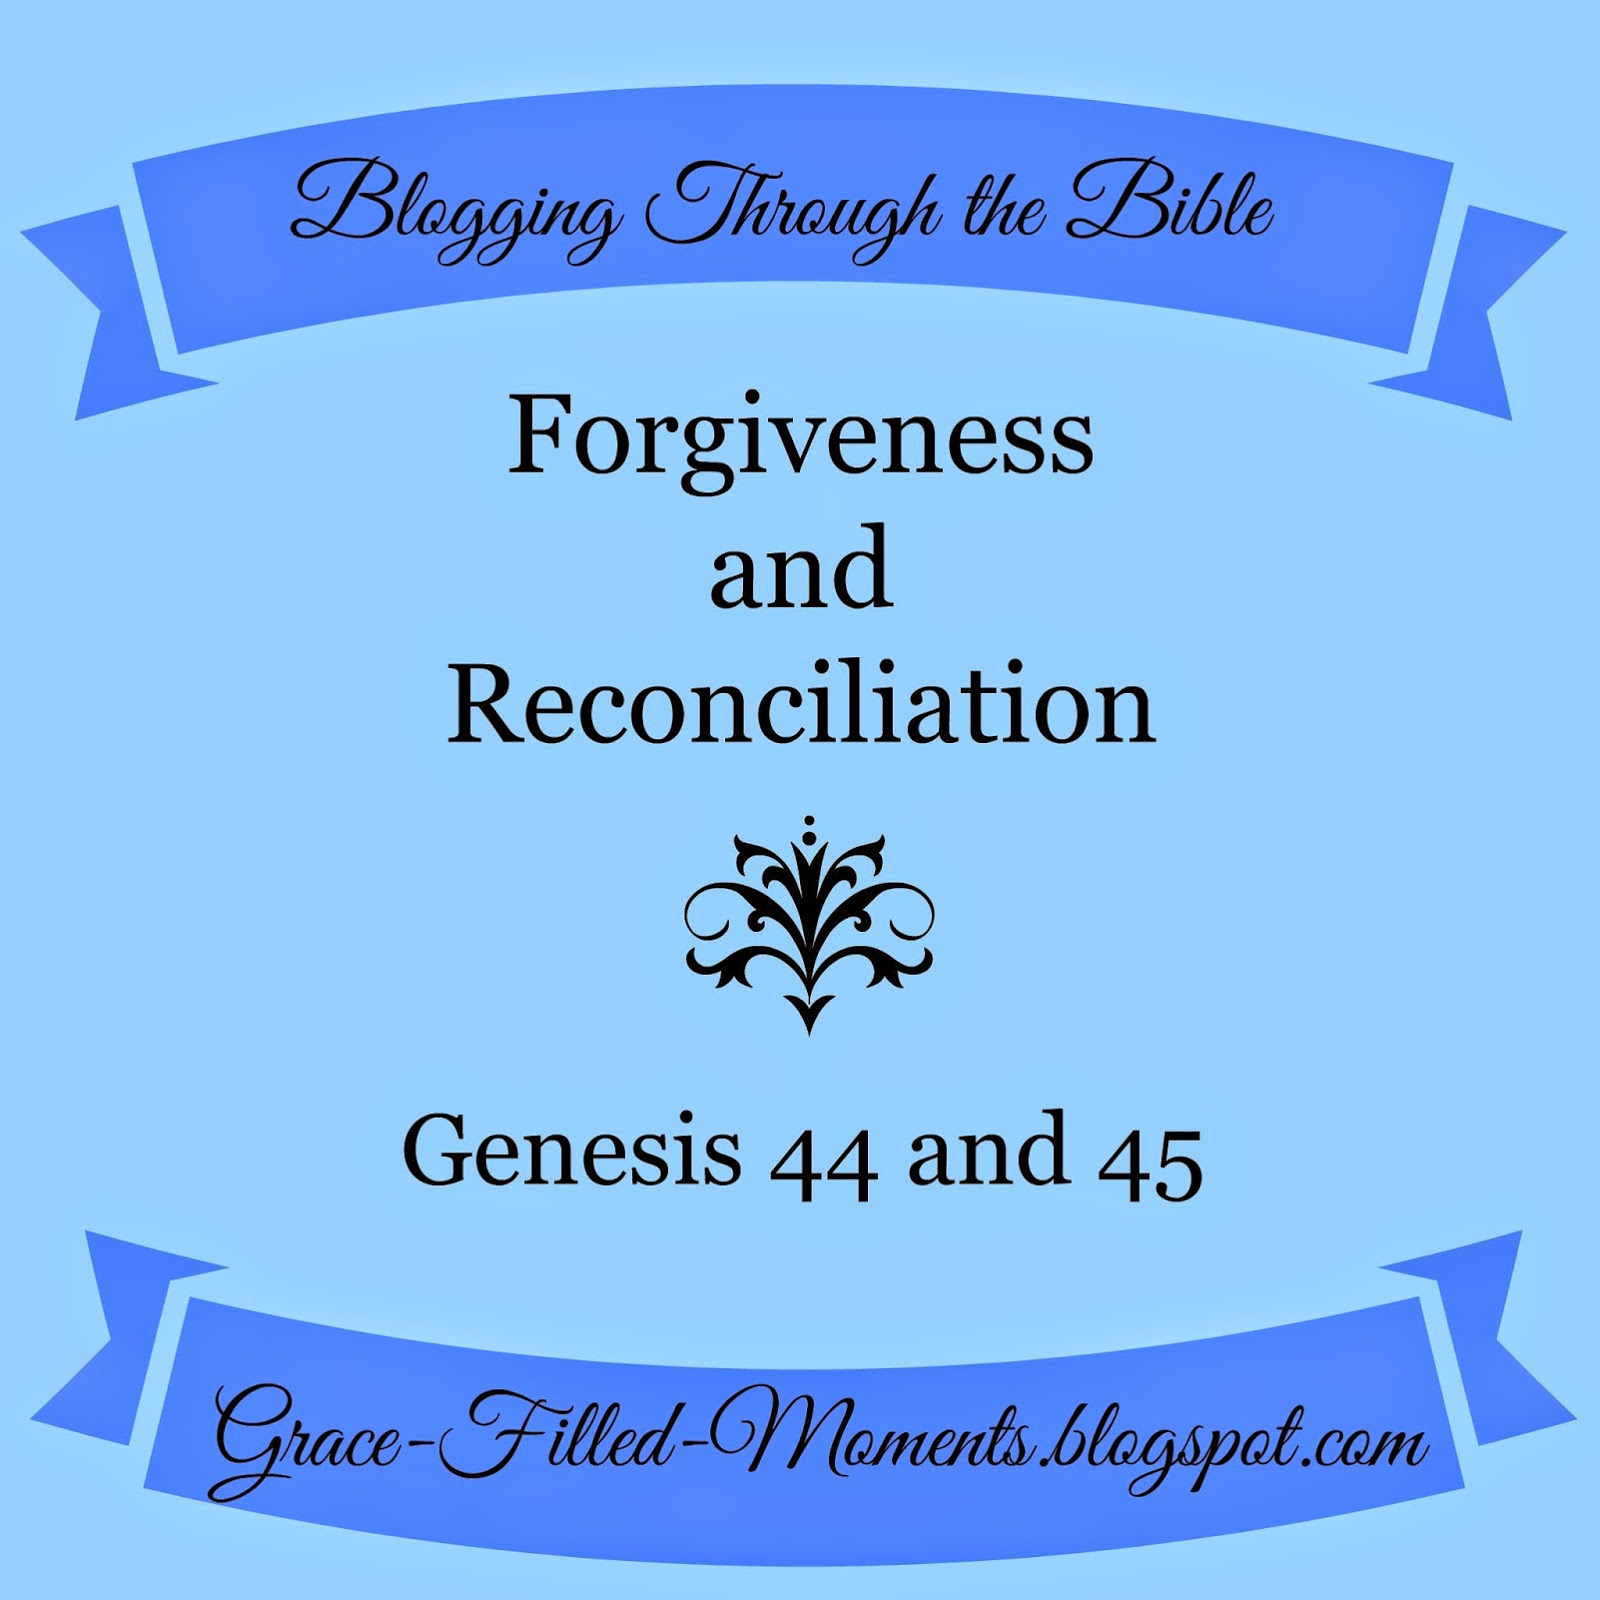 Genesis 44 and 45